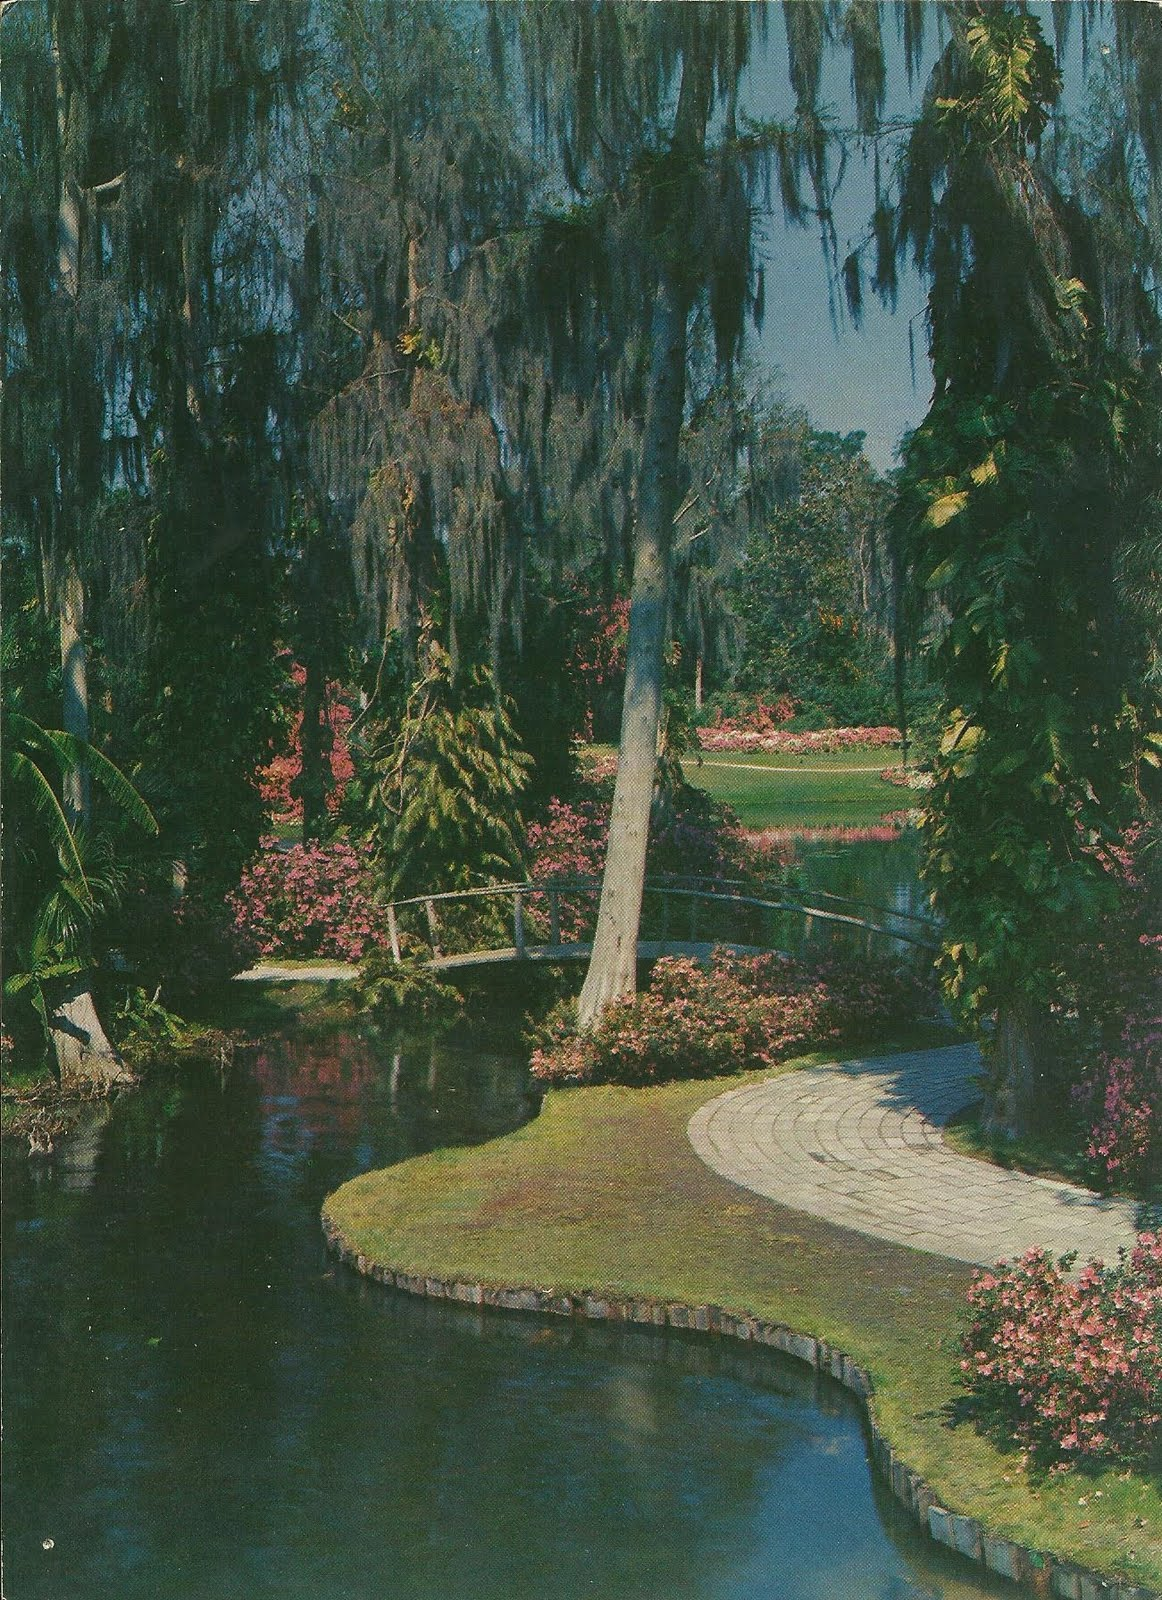 Vintage Travel Postcards: Cypress Gardens